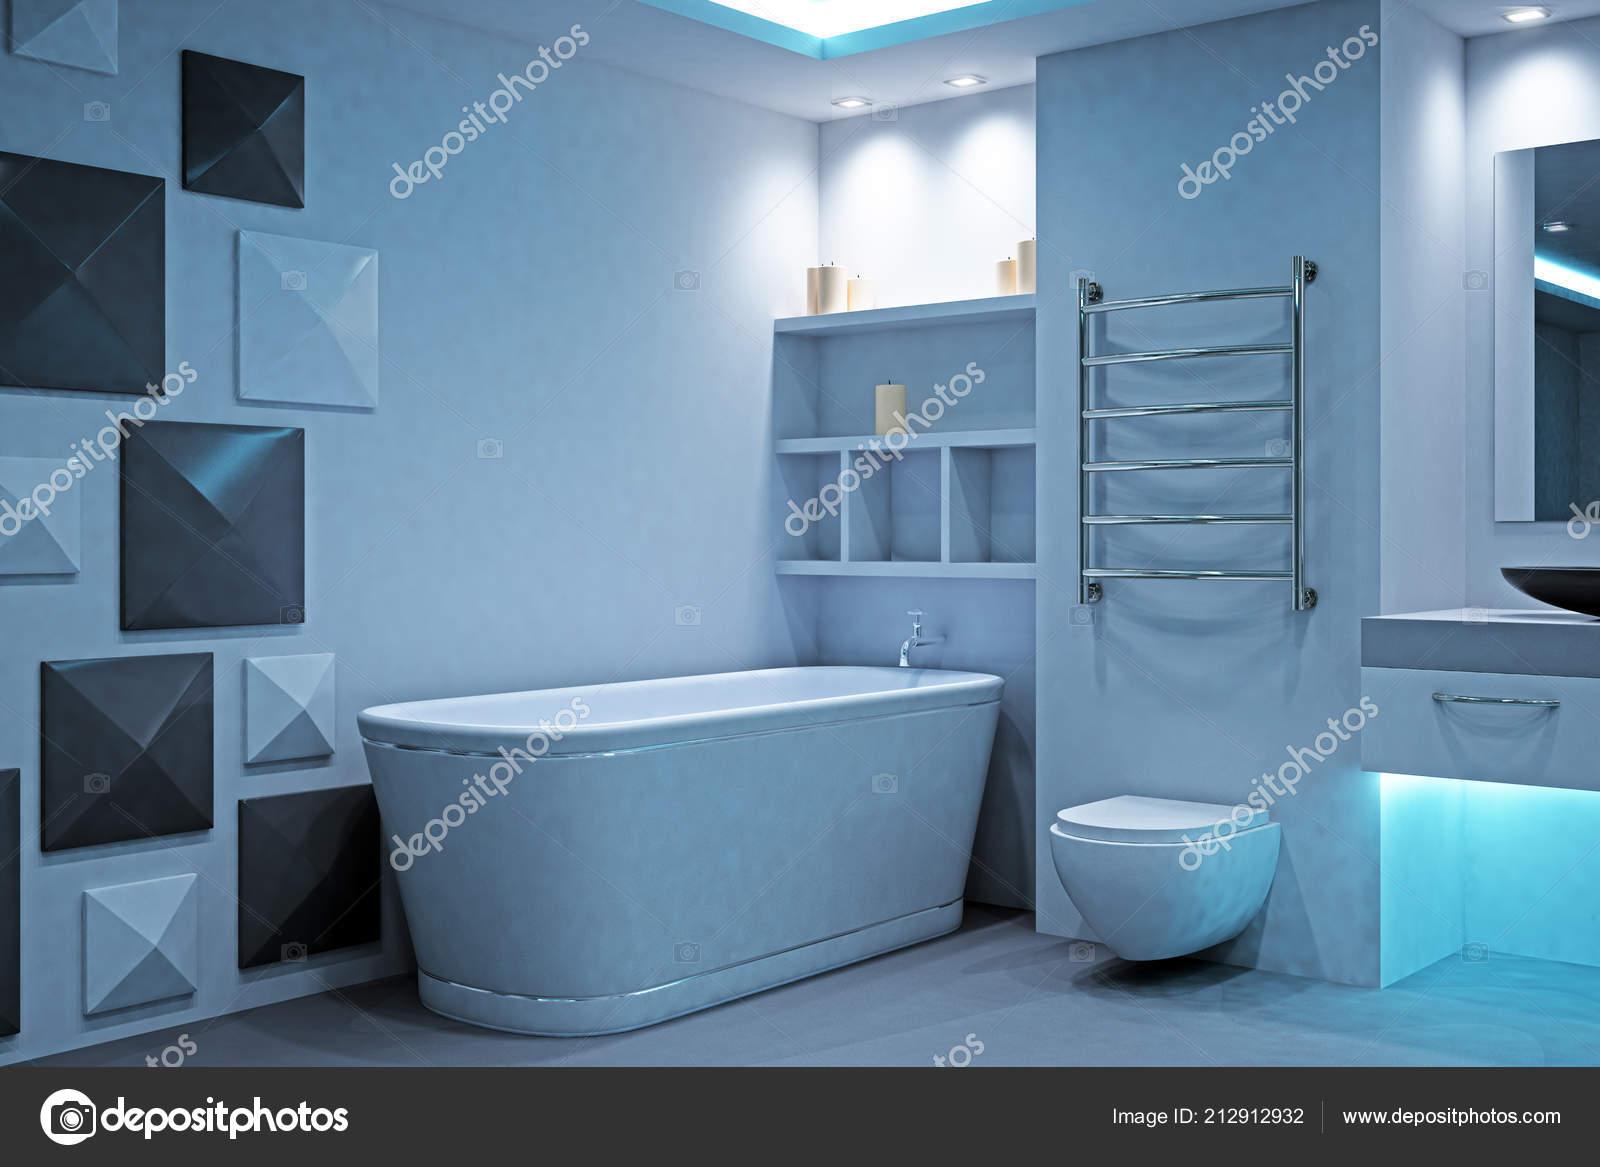 Interior ba o futurista iluminado limpio concepto estilo dise o render foto de stock peshkov Diseno interior futurista